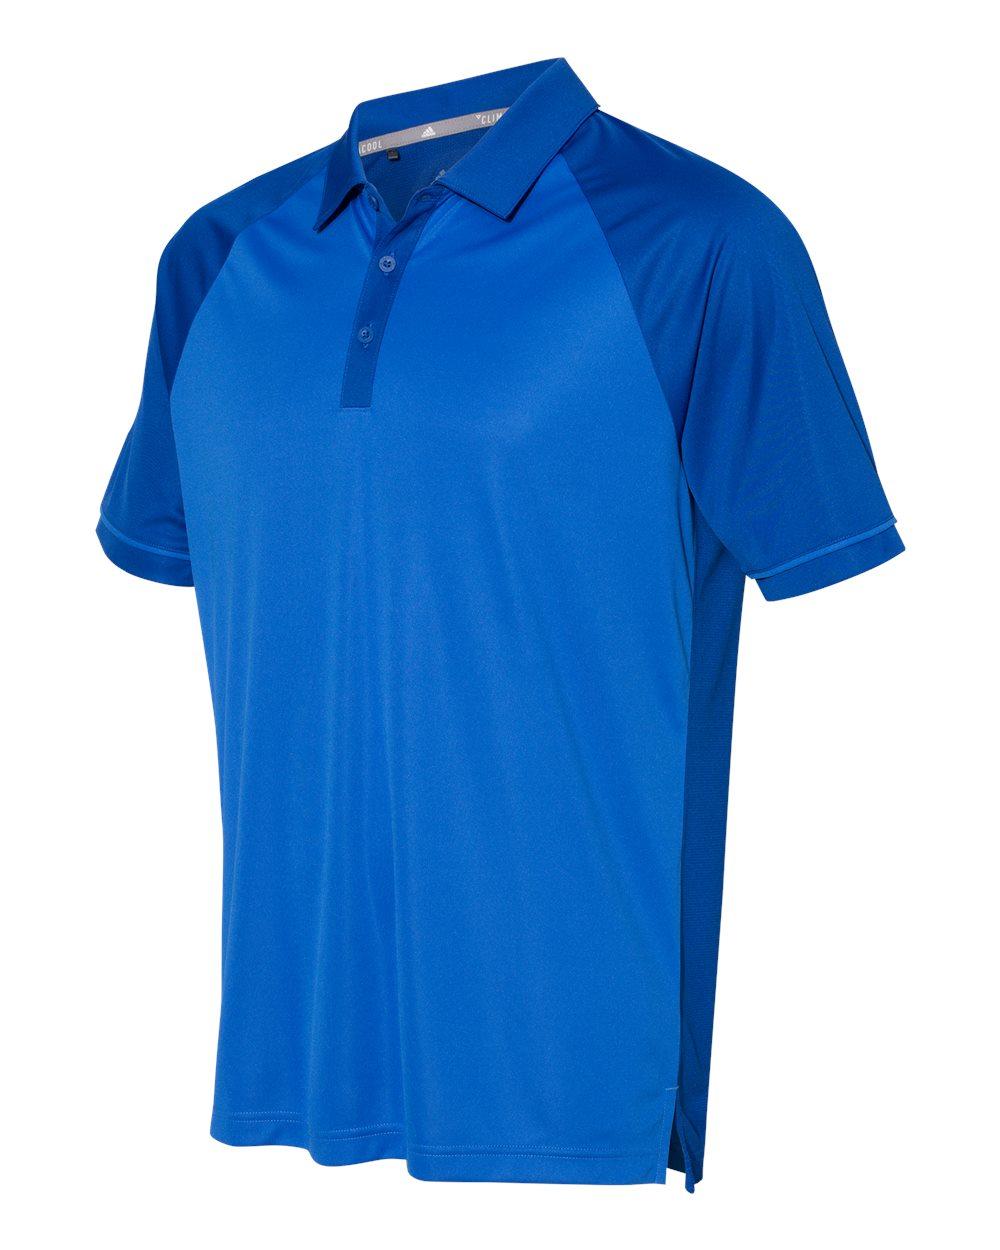 Adidas A207 - Men's Climacool Jacquard Raglan Polo